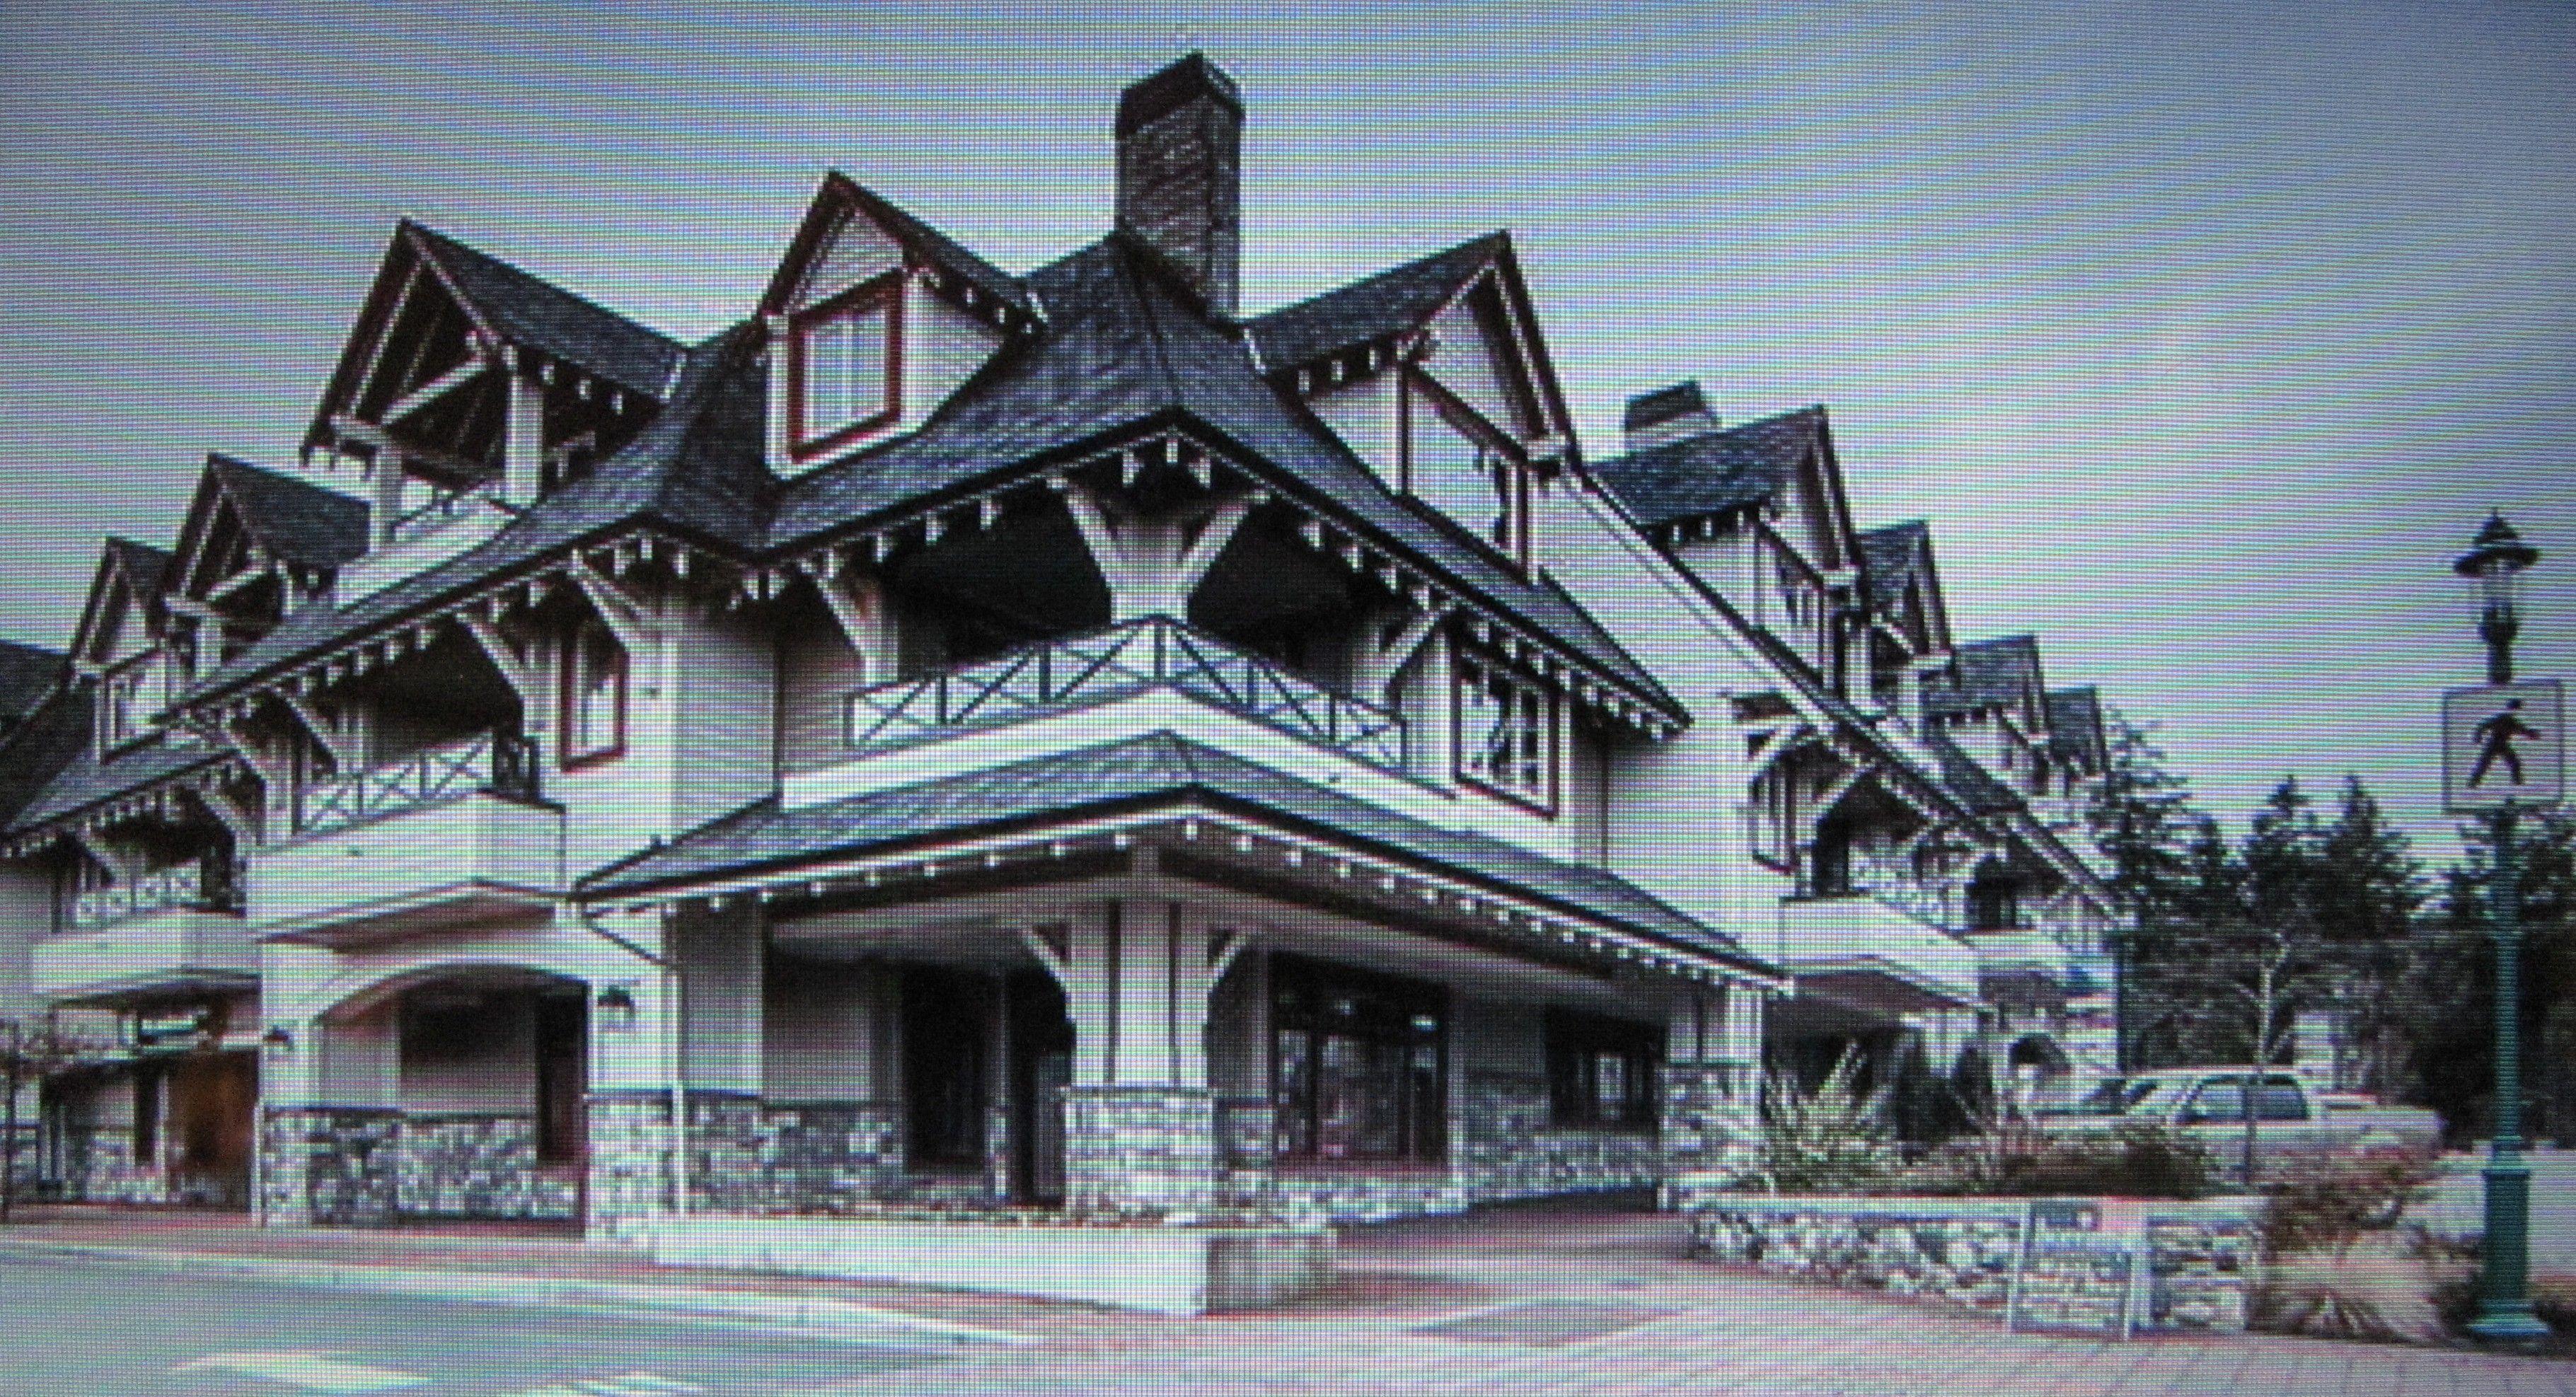 Villa Rose condo in downtown Qualicum Beach